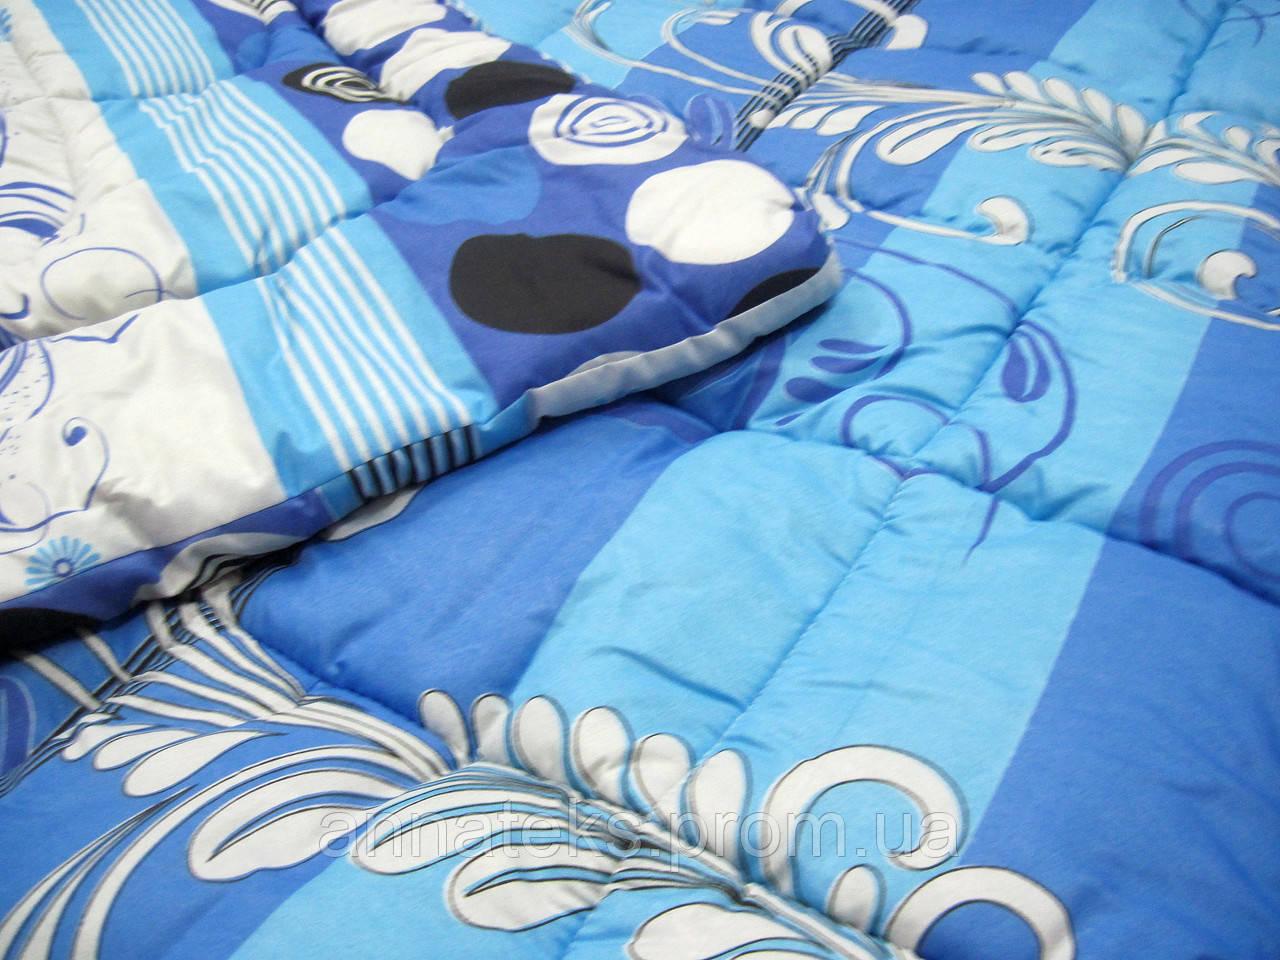 Одеяло Полушерстяное поликоттон 1,72*2,05